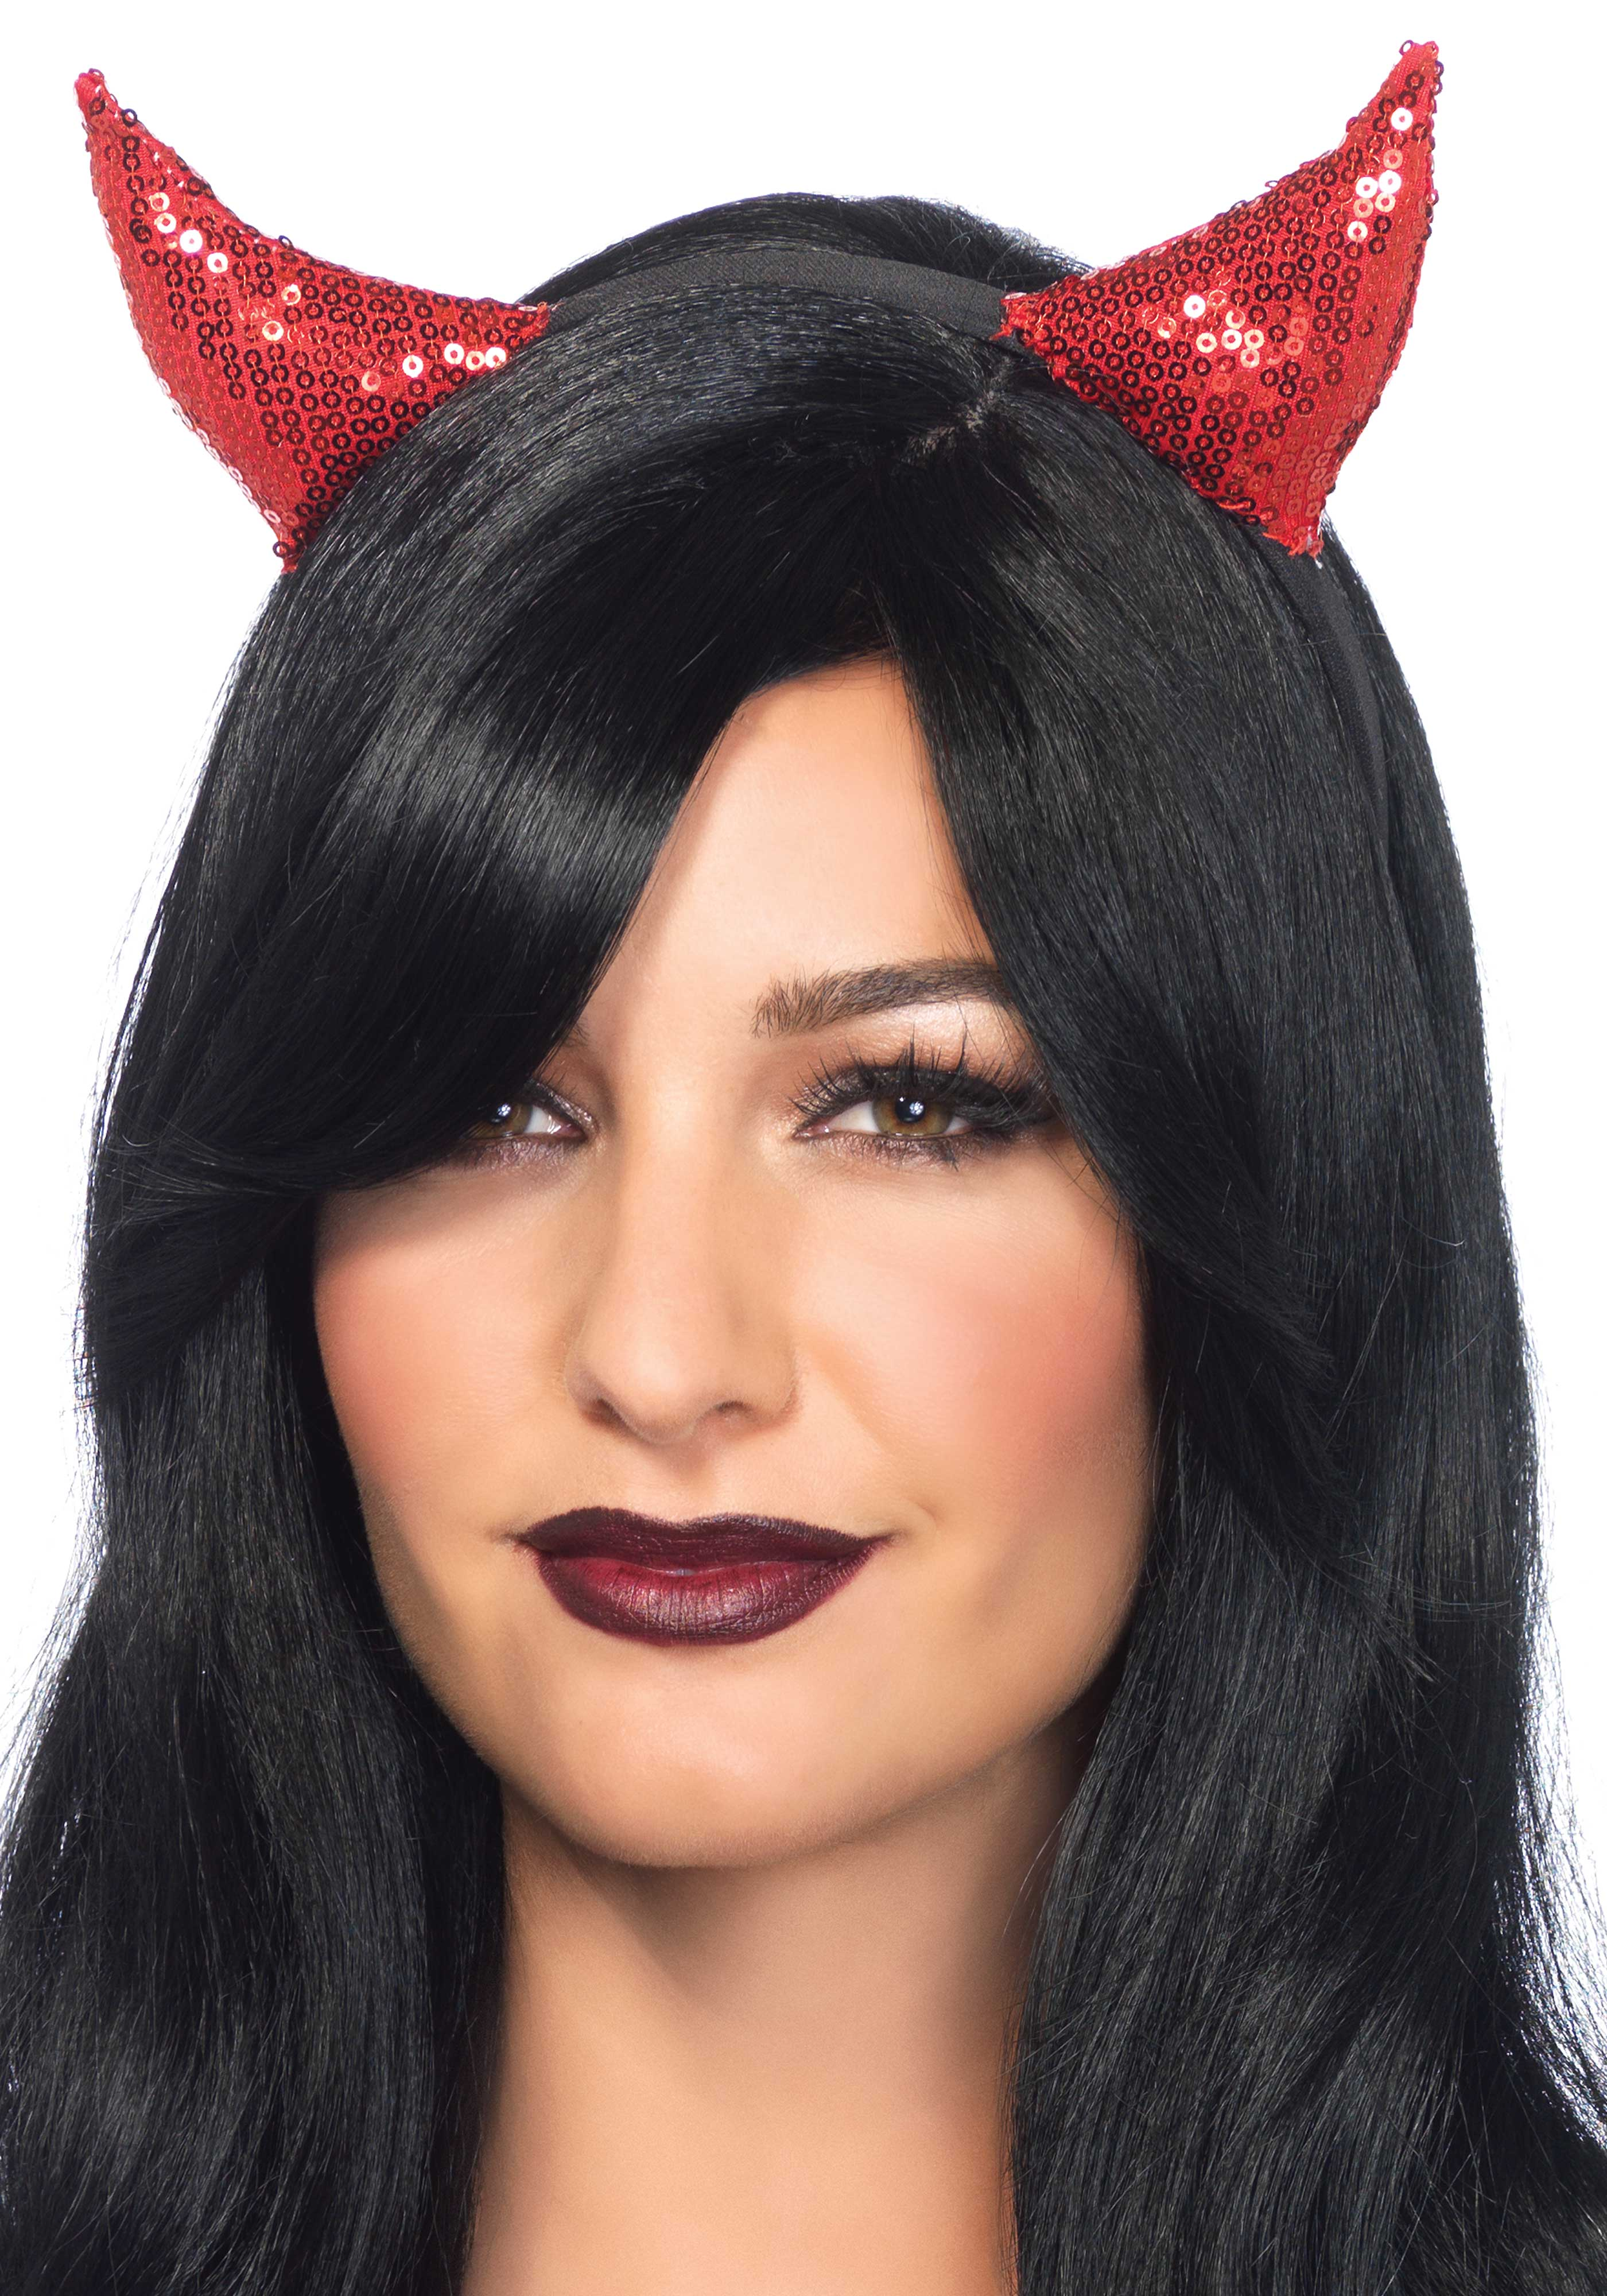 Headband with sequin devil horns.